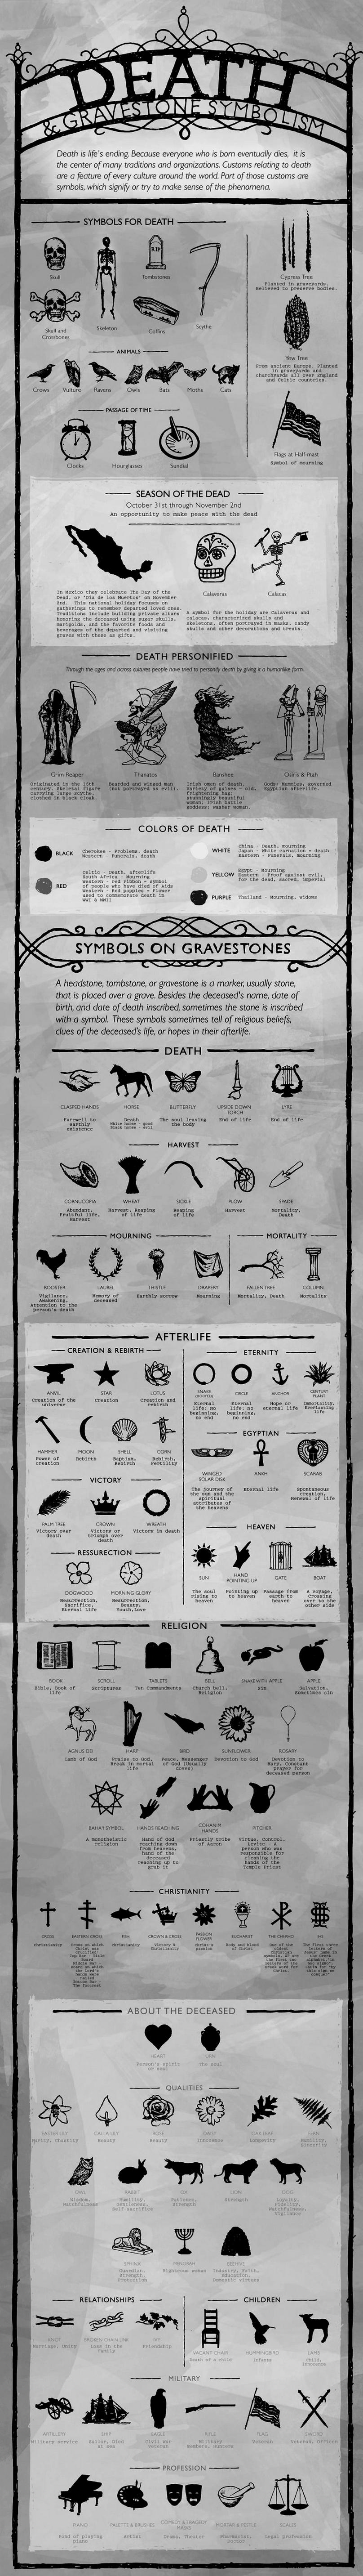 Death & Gravestone Symbolism. . Death & Gravestone Symbolism